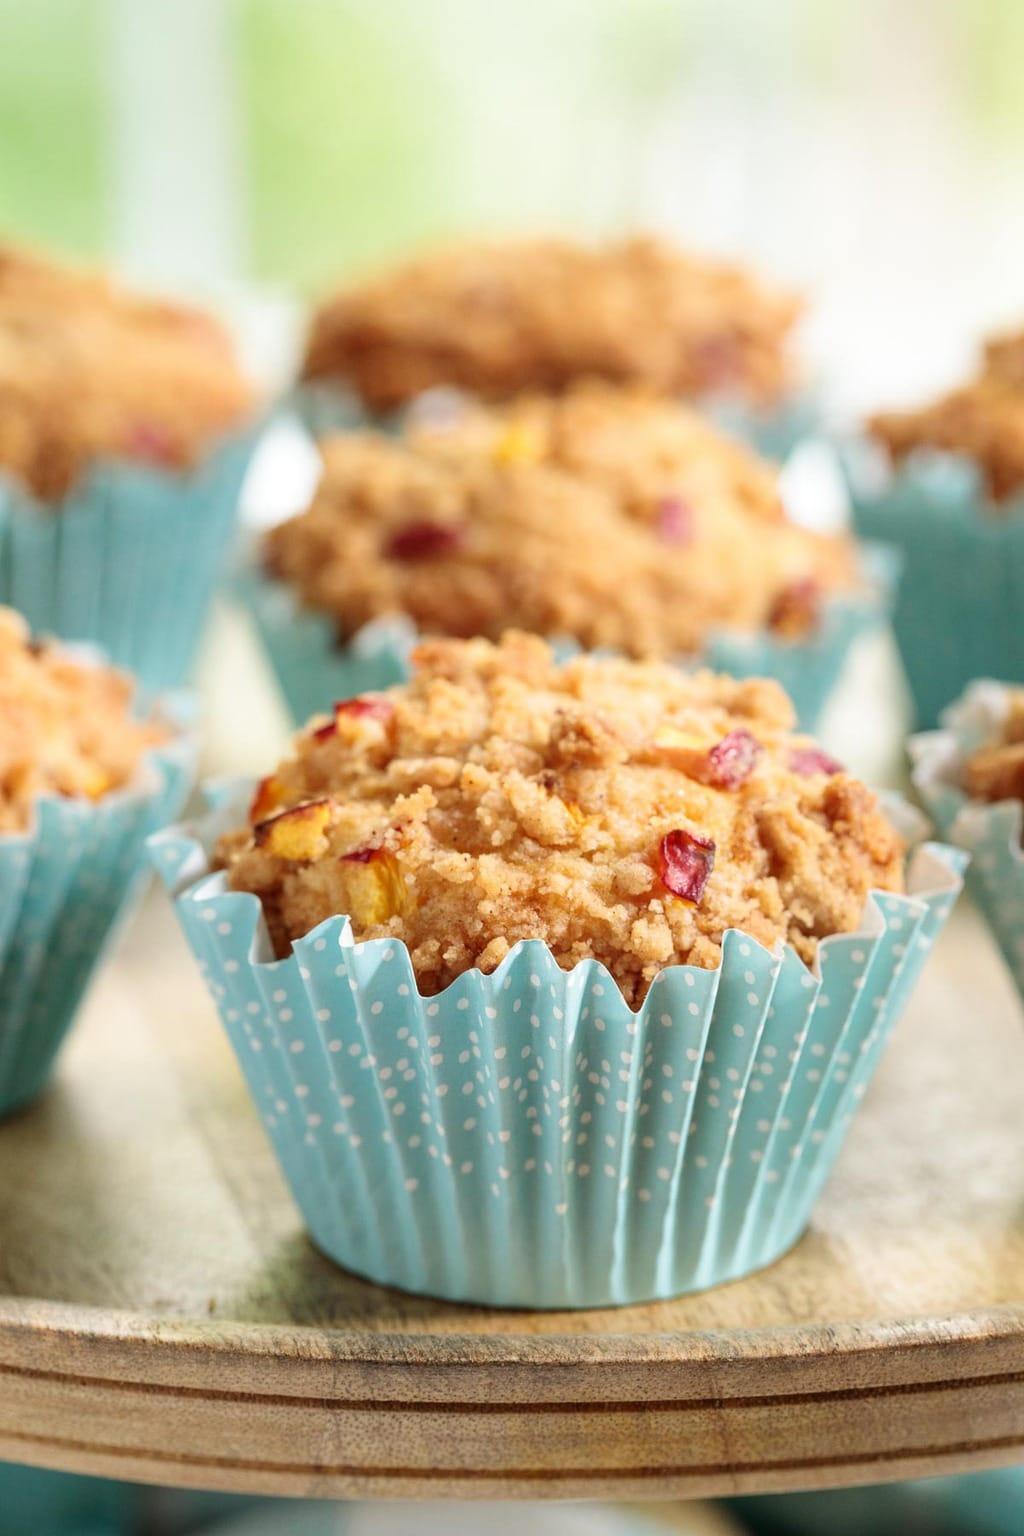 Closeup photo of a peach crumble muffin on a wood dessert pedestal.